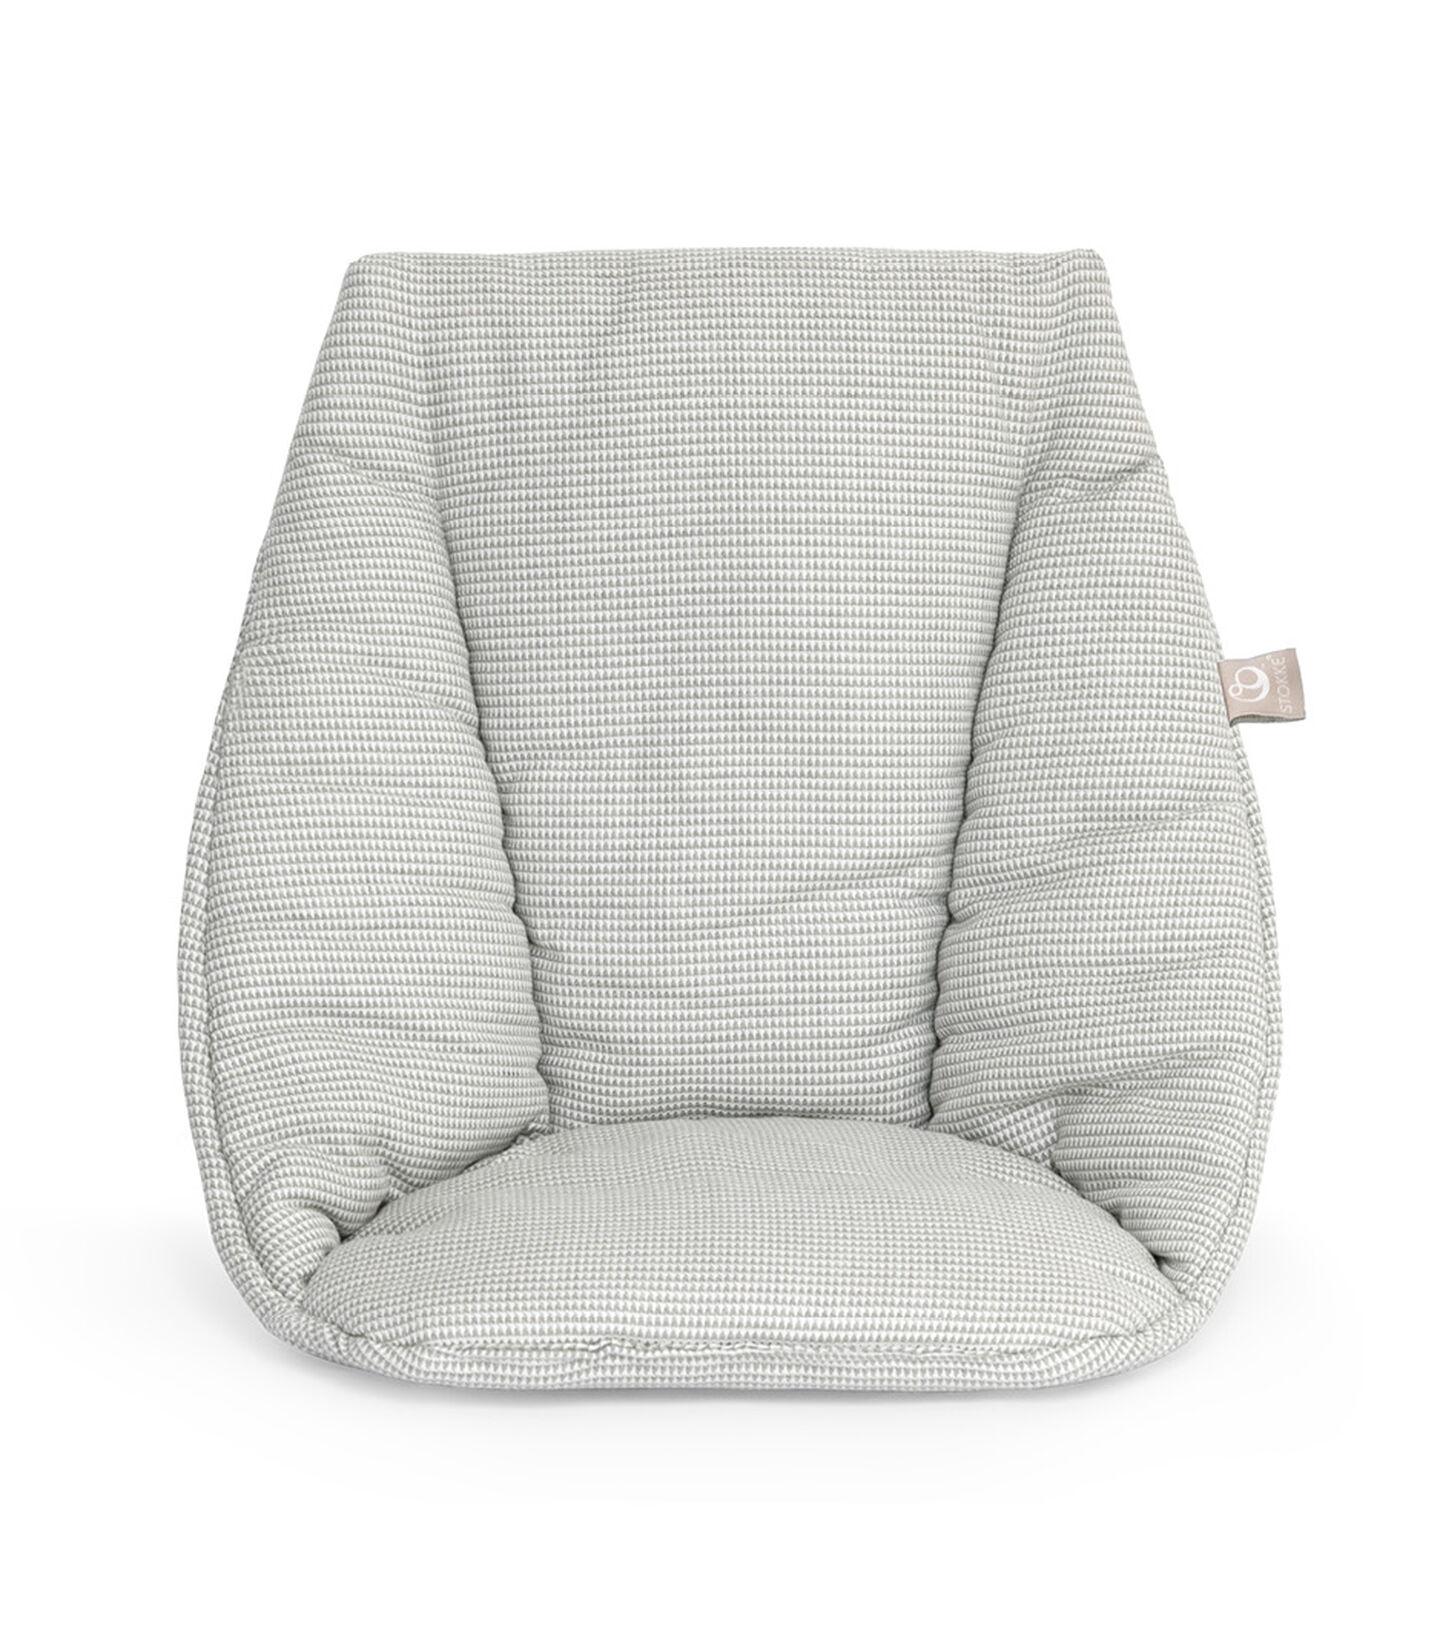 Tripp Trapp® Baby Cushion Nordic Grey, Nordic Grey, mainview view 1